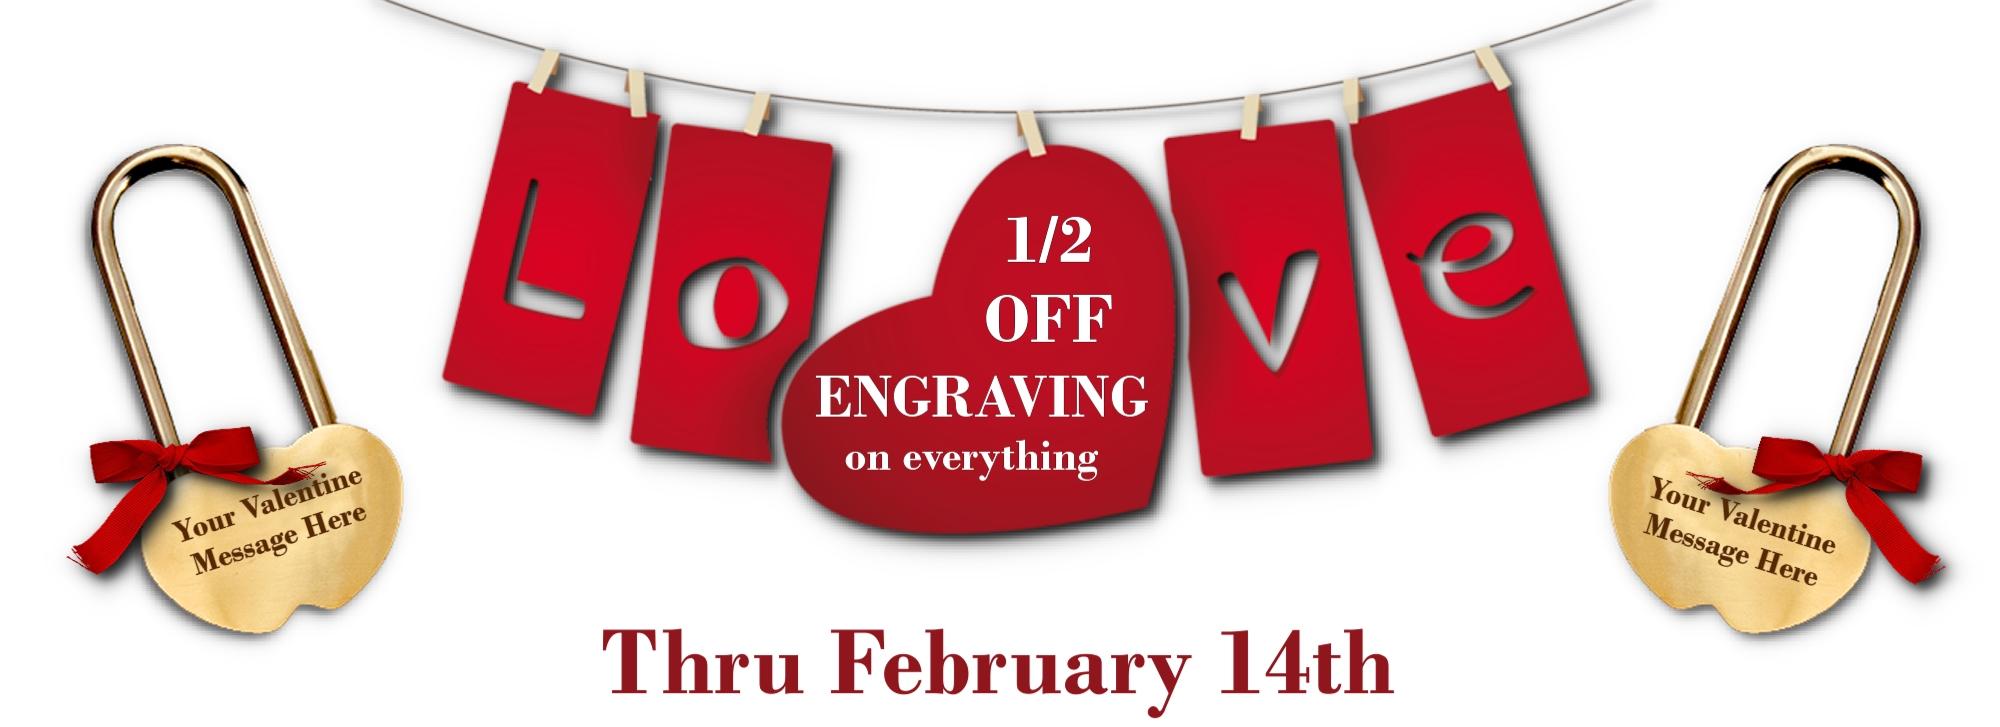 LoveLocks Valentines